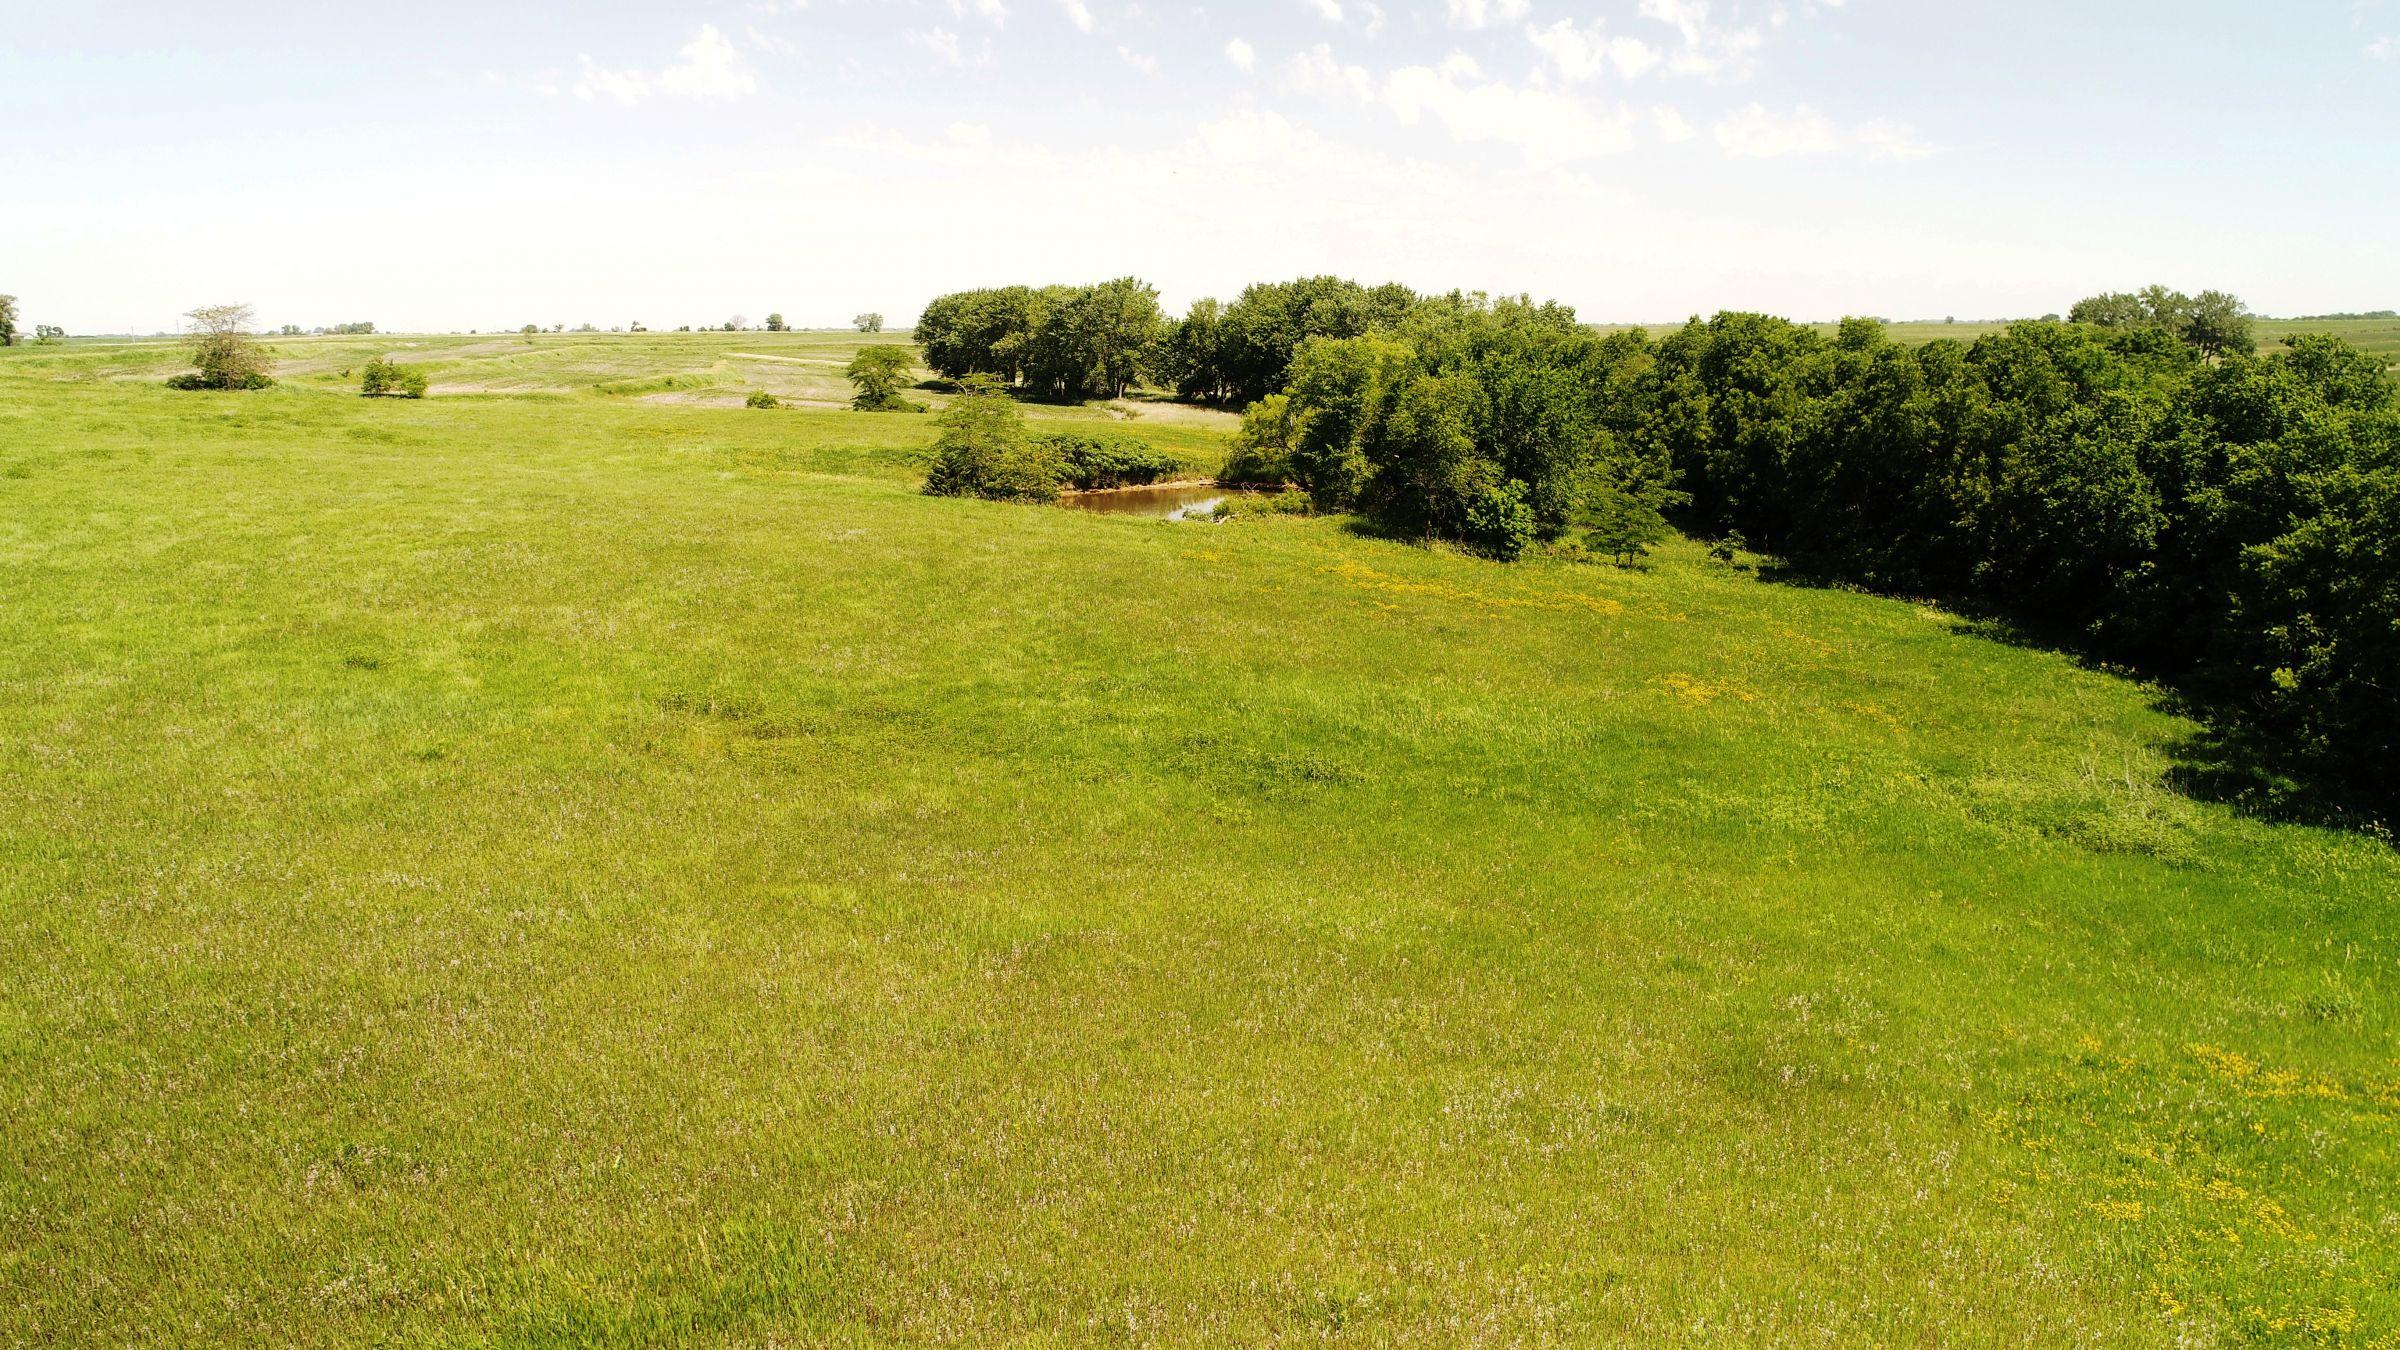 land-iowa-38-acres-listing-number-15594-2-2021-06-16-212125.JPG